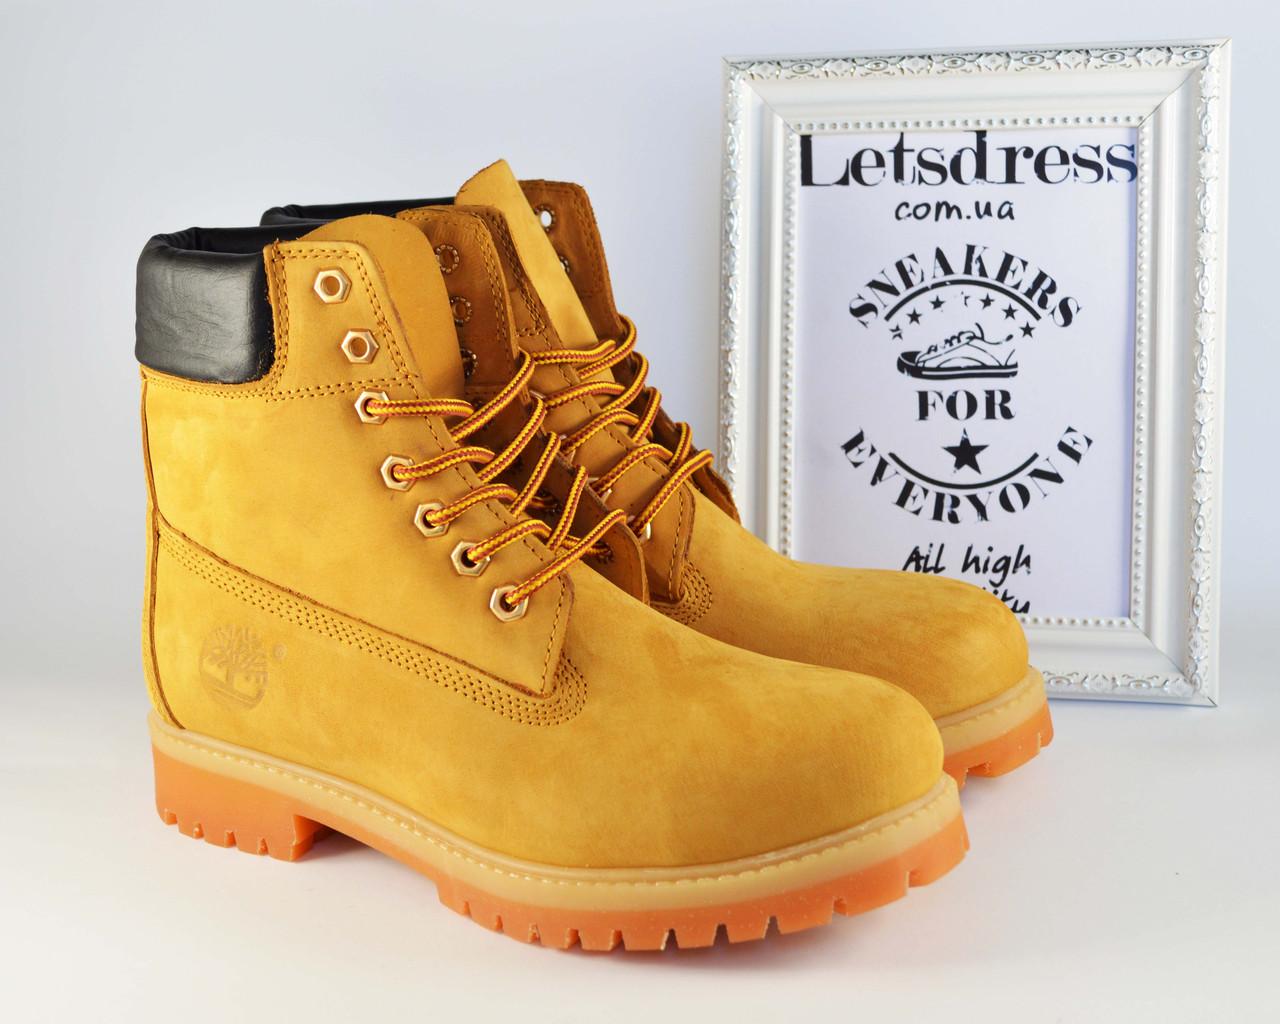 Мужские кожаные ботинки Timberland Classic 6 inch Yellow Тимберленд желтые  бежевые - LetsDress-Shop в 3e3e1725141